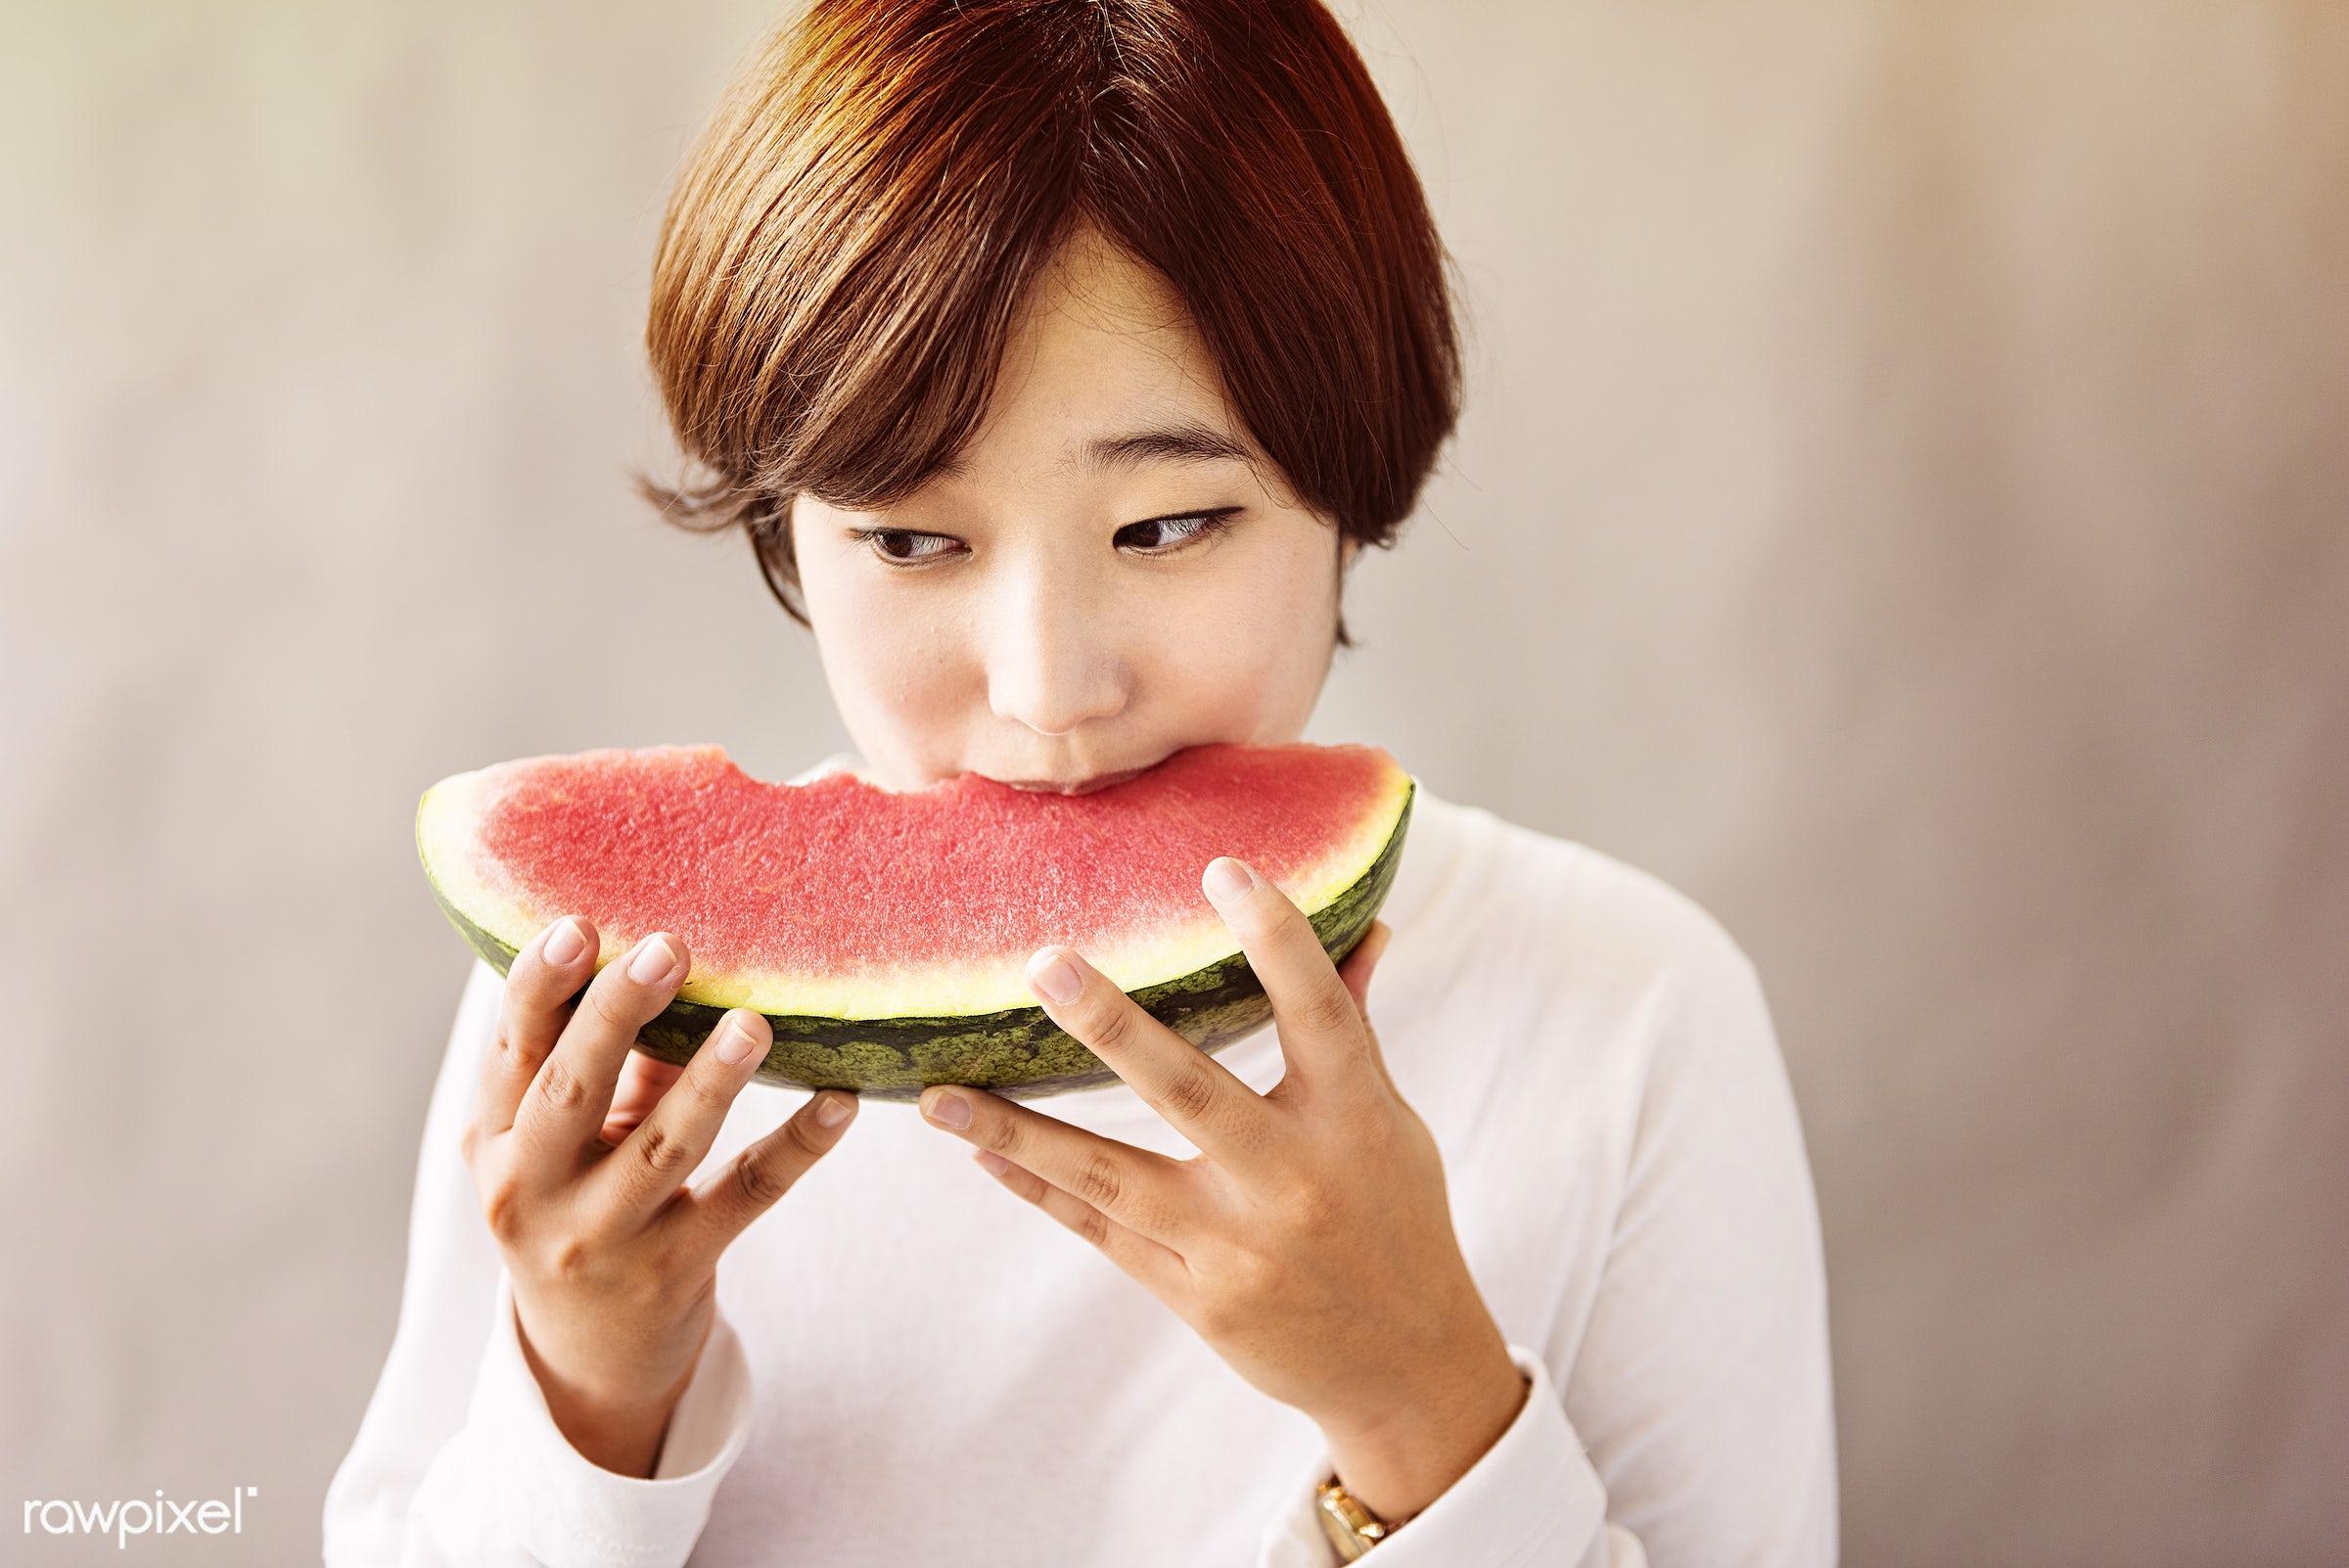 refreshment, asian, asian ethnicity, calm, casual, cheerful, chilling, dessert, eating, enjoyment, fresh, fruit, girl,...